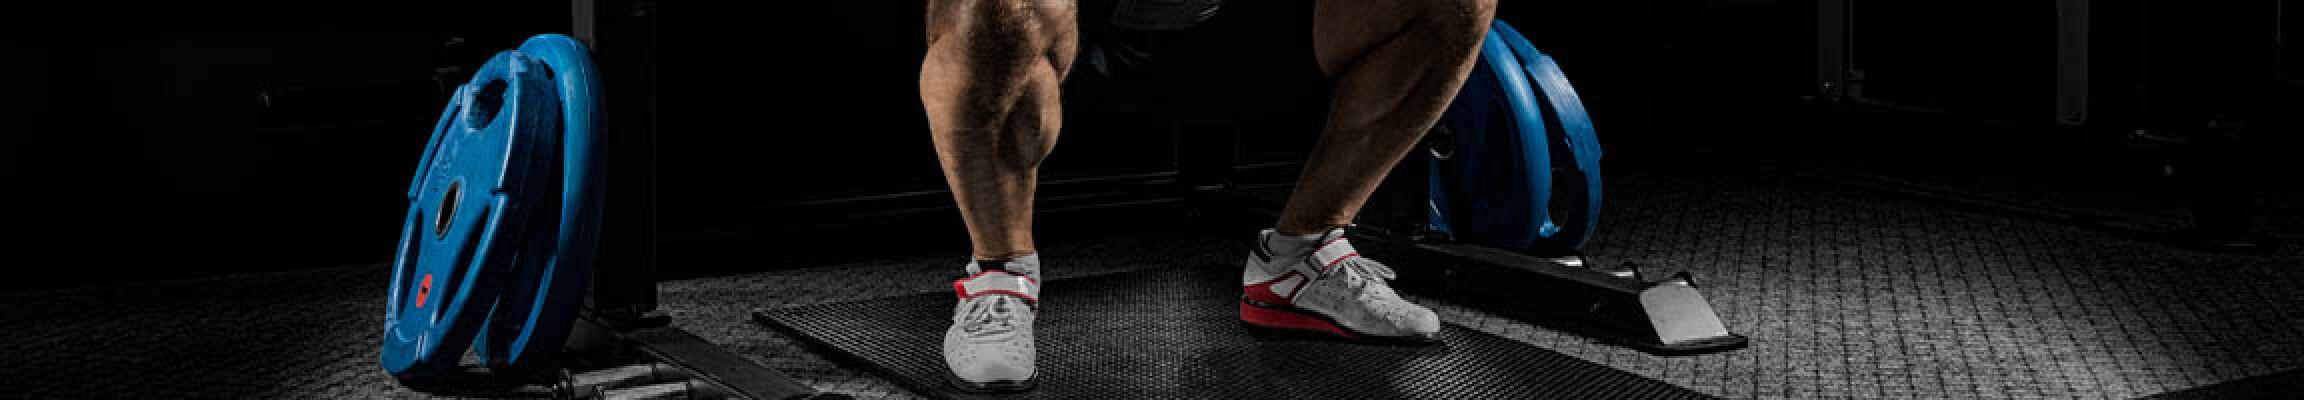 Fazit Schuhe zum Gewichtheben